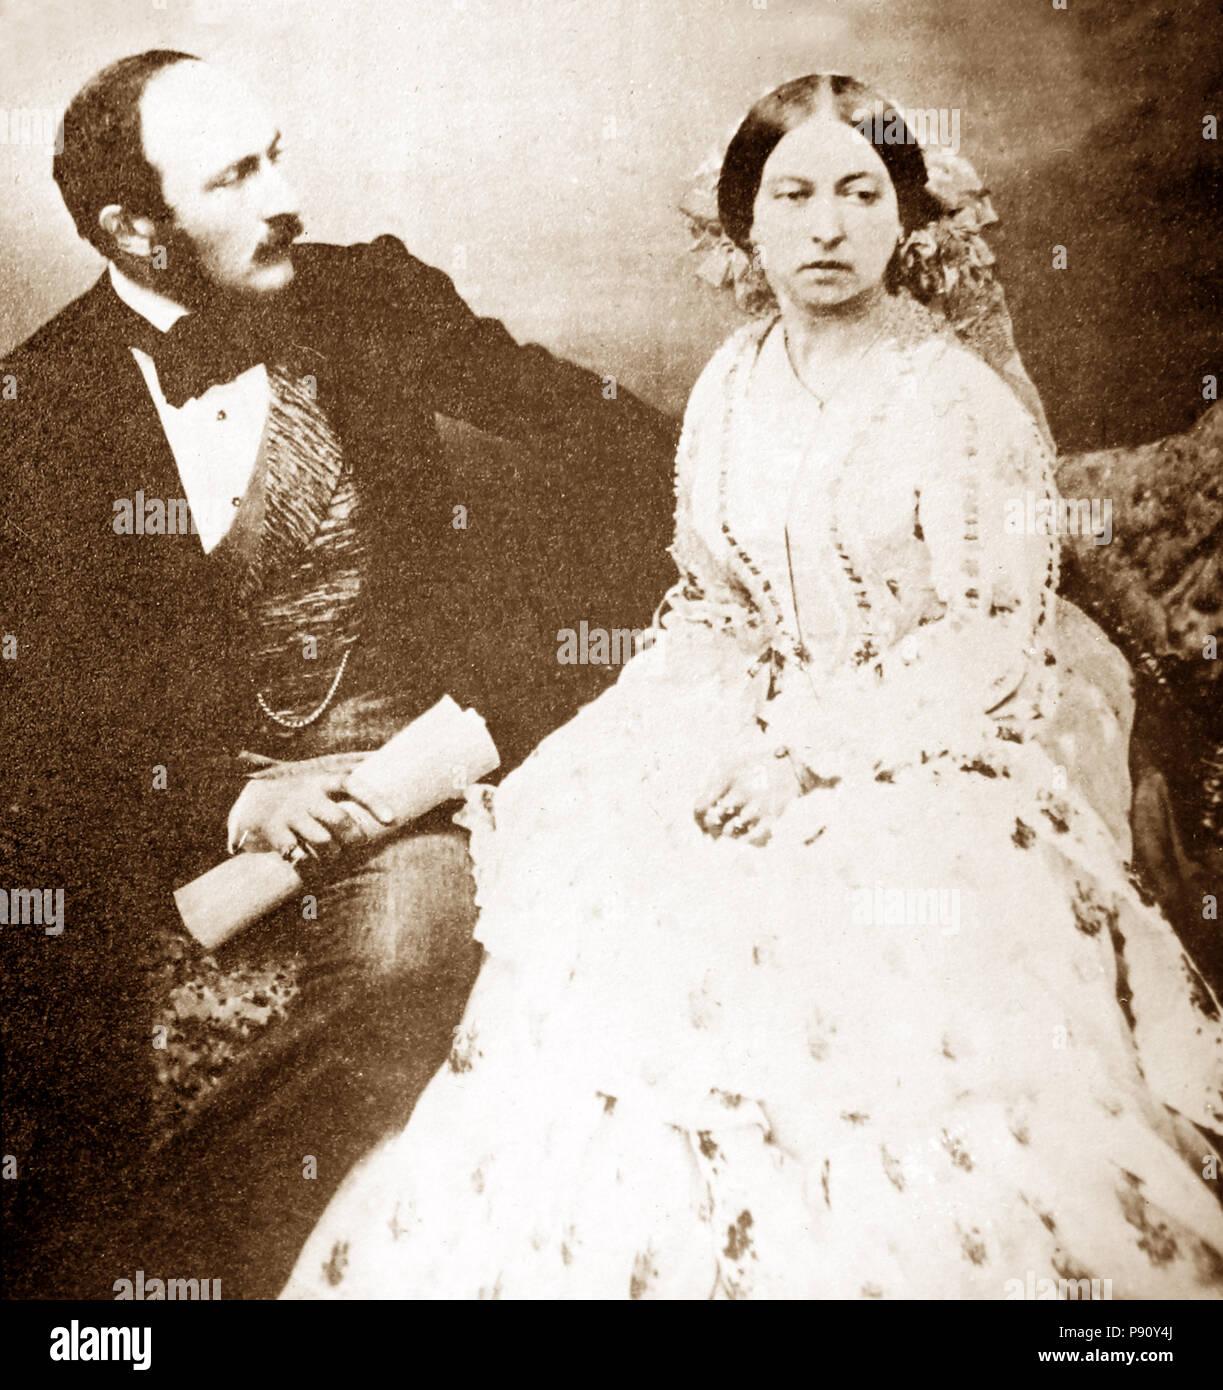 Queen Victoria and Prince Albert - Stock Image